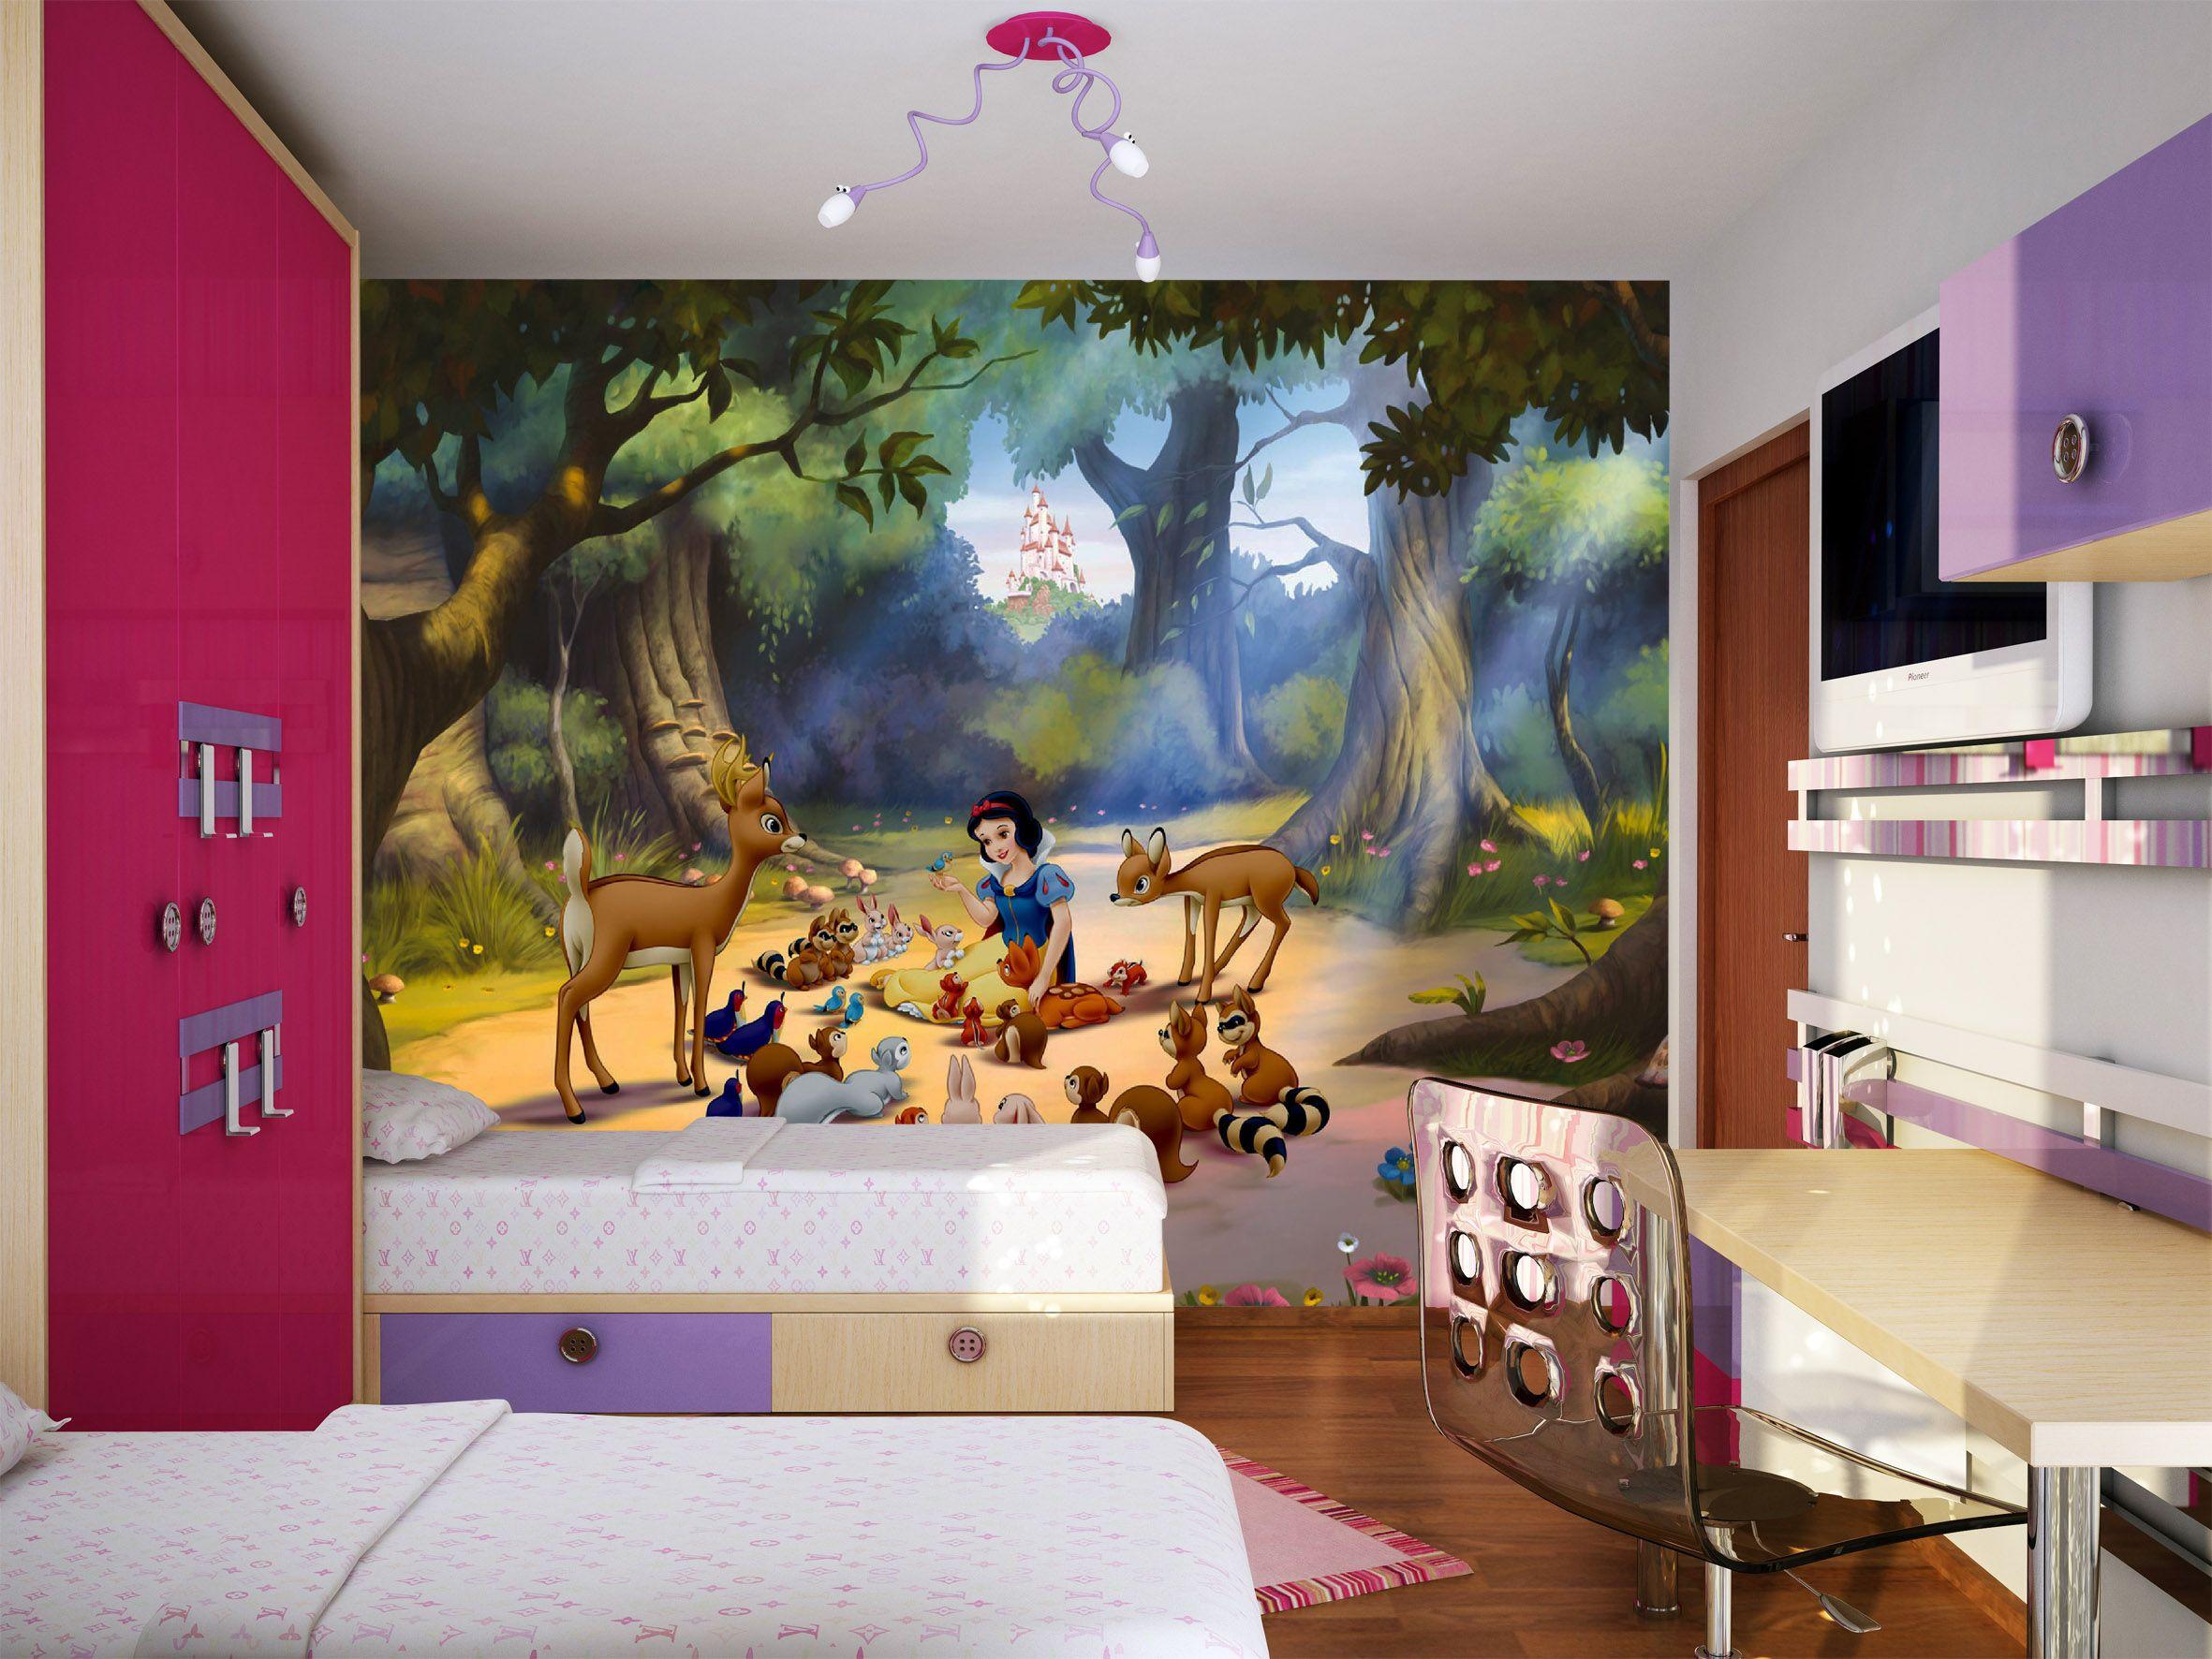 Disney Snow White Wallpaper Mural By Wallandmore Bea